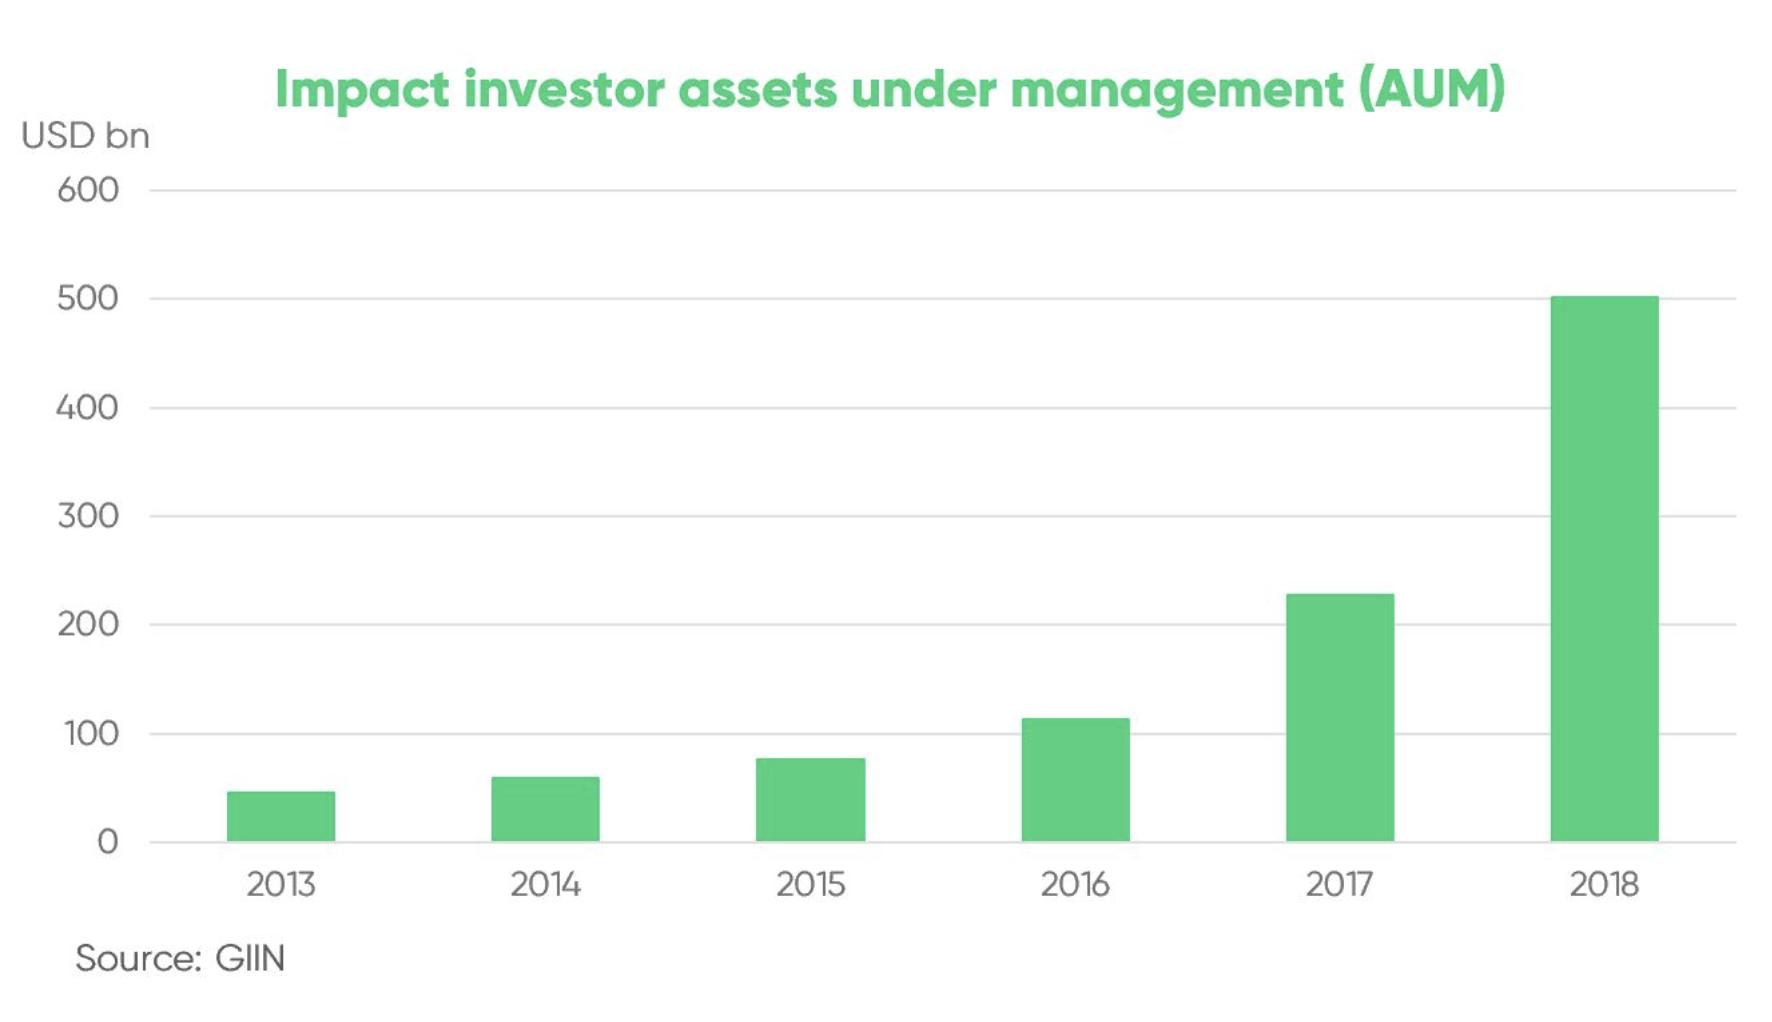 Impact investor assets under management (AUM)